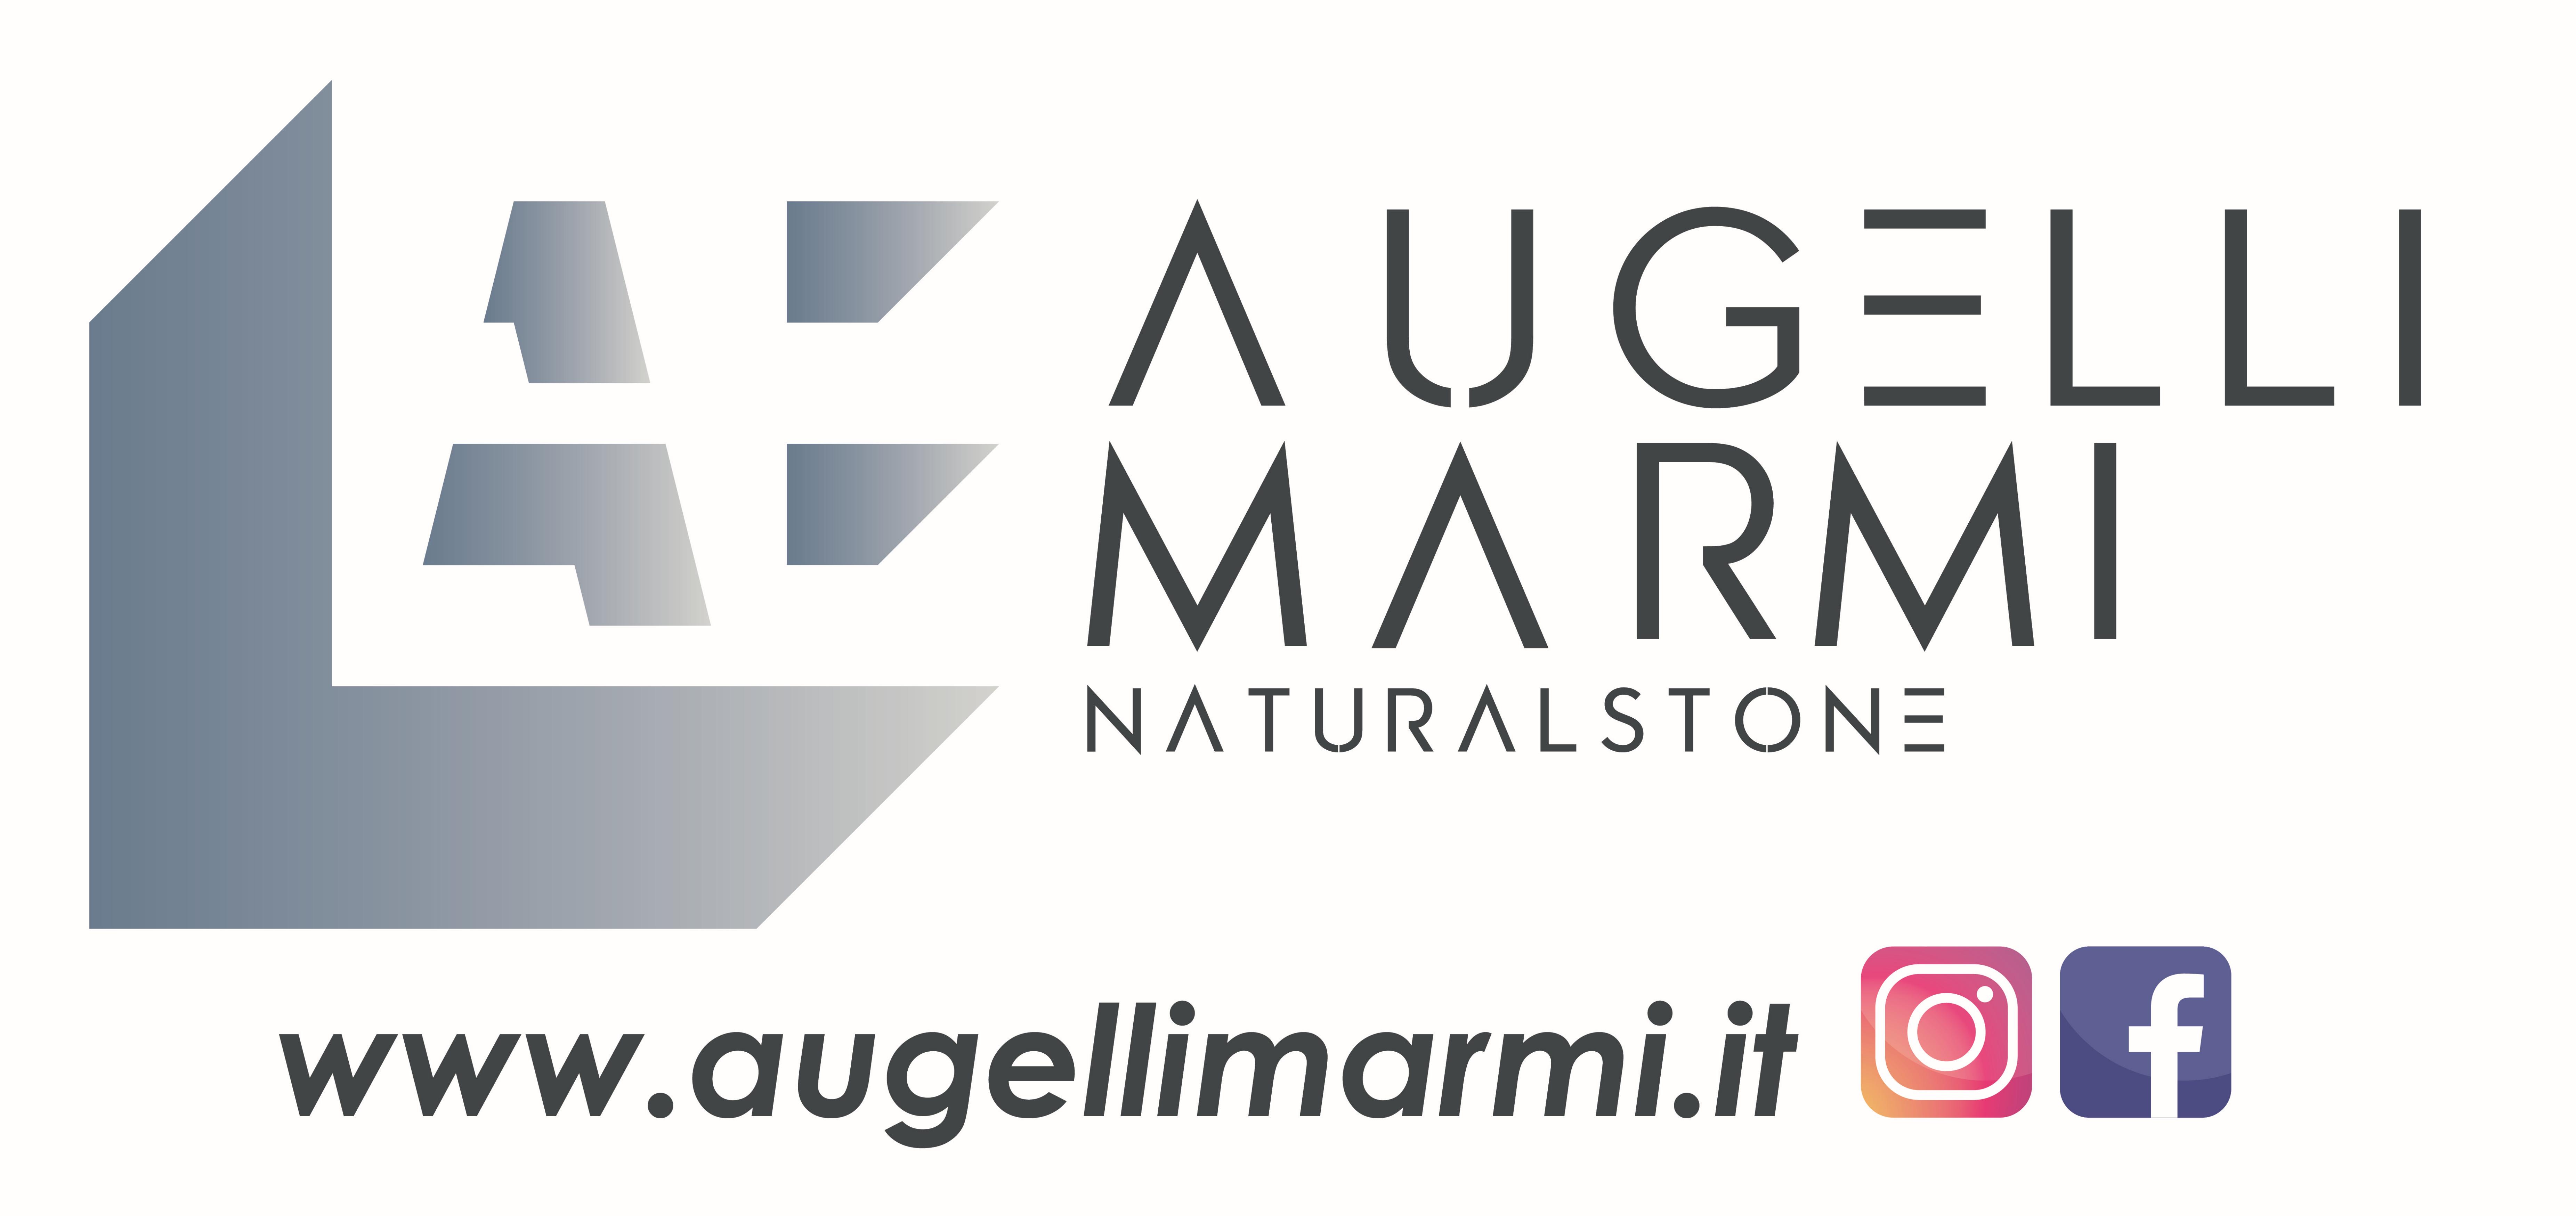 AUGELLI MARMI